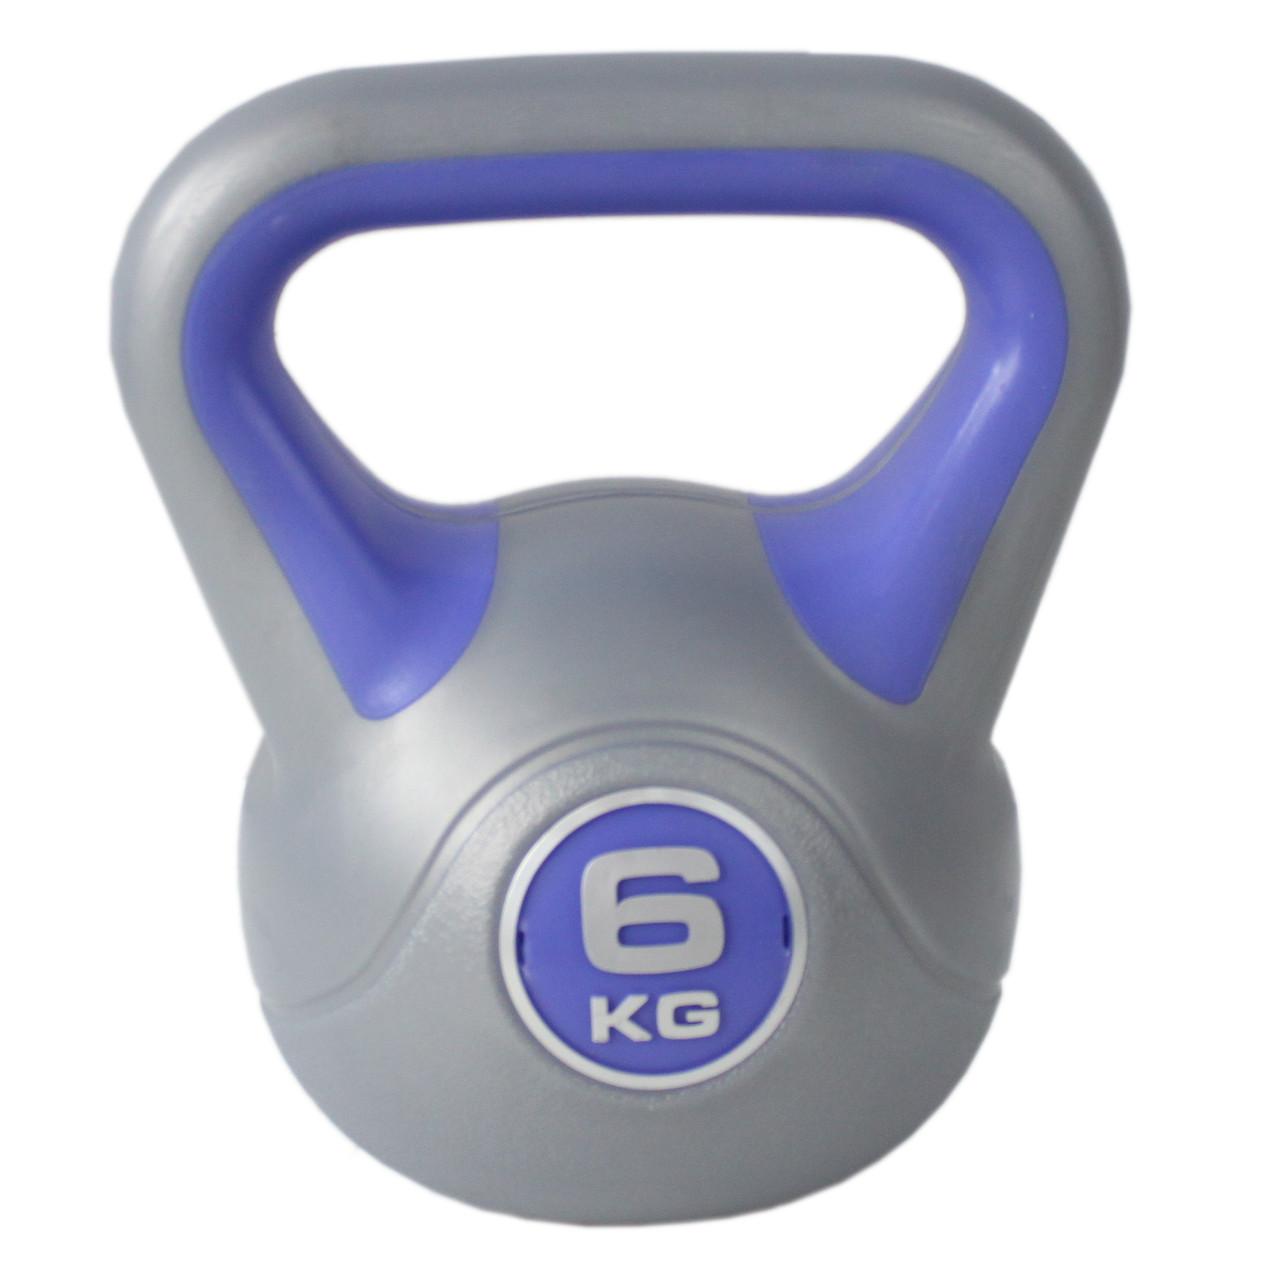 Гиря SportVida 6 кг SV-HK0079